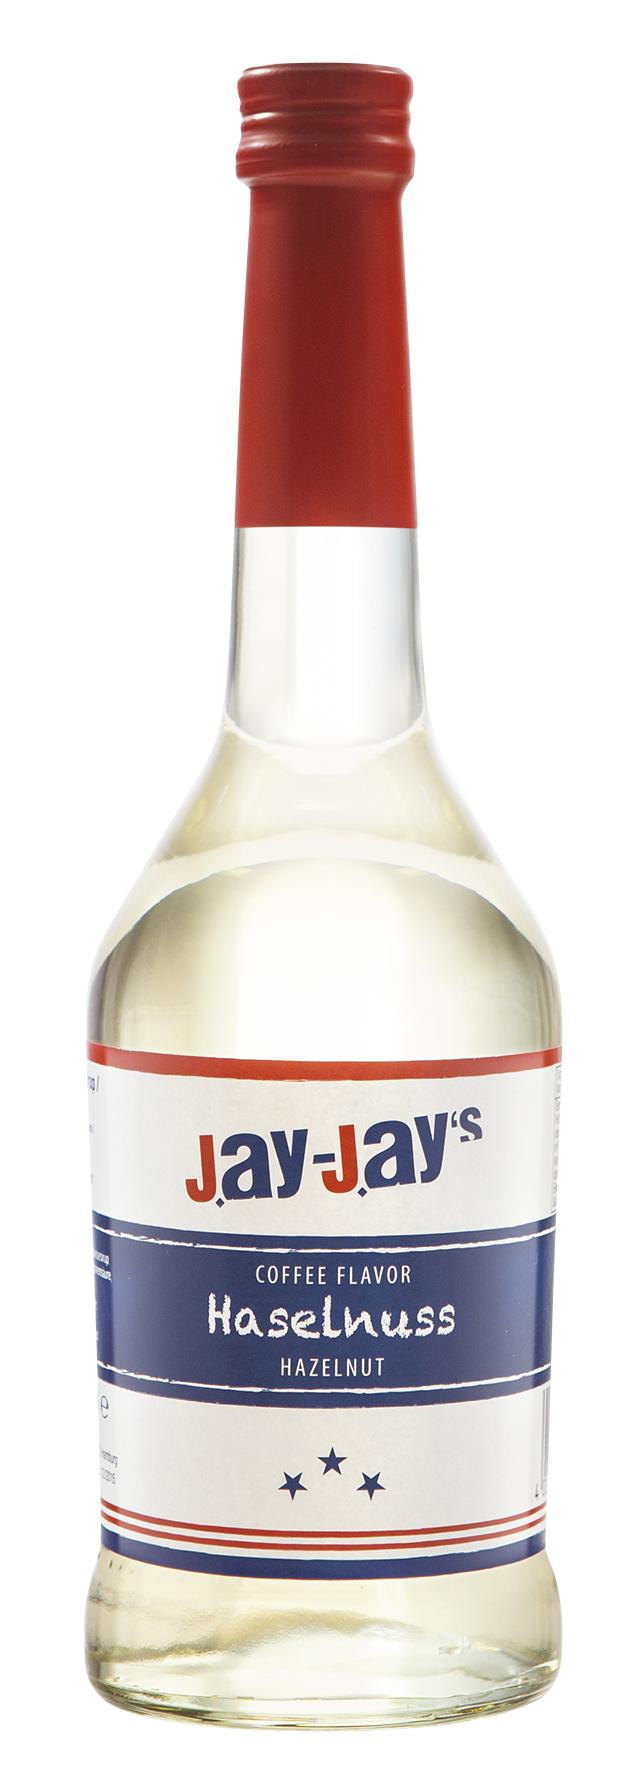 jay-jay-s-coffee-flavor-haselnuss-500-ml